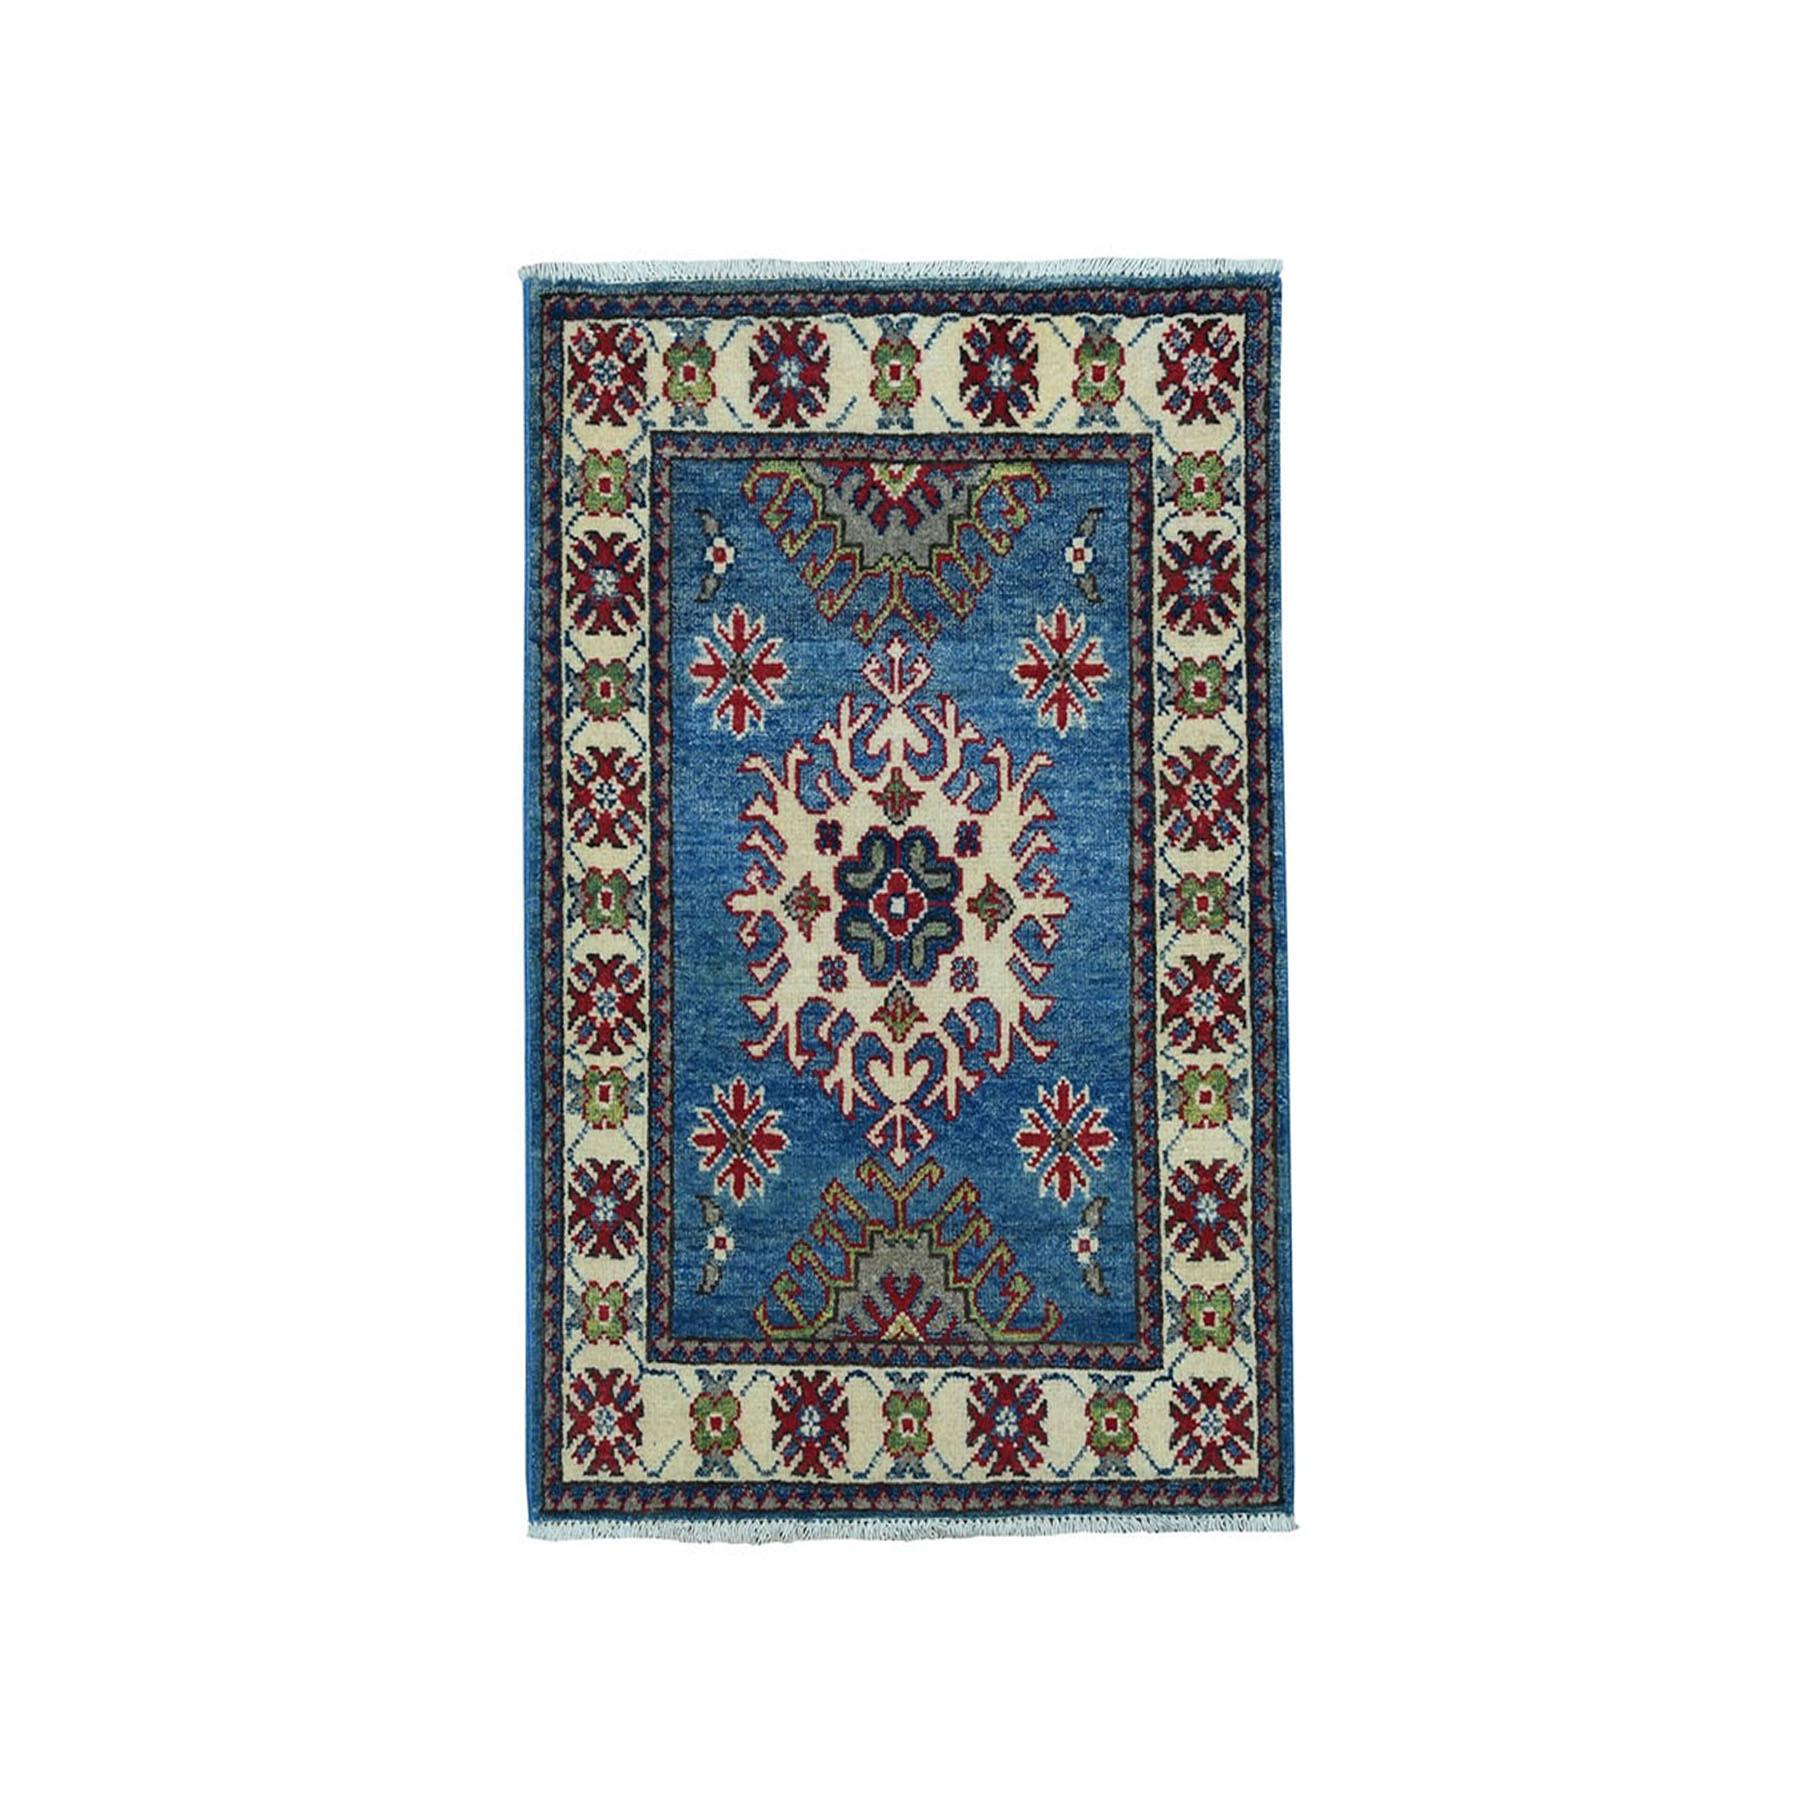 "2'x3'1"" Blue Geometric Design Kazak Pure Wool Hand-Knotted Oriental Rug 51029"